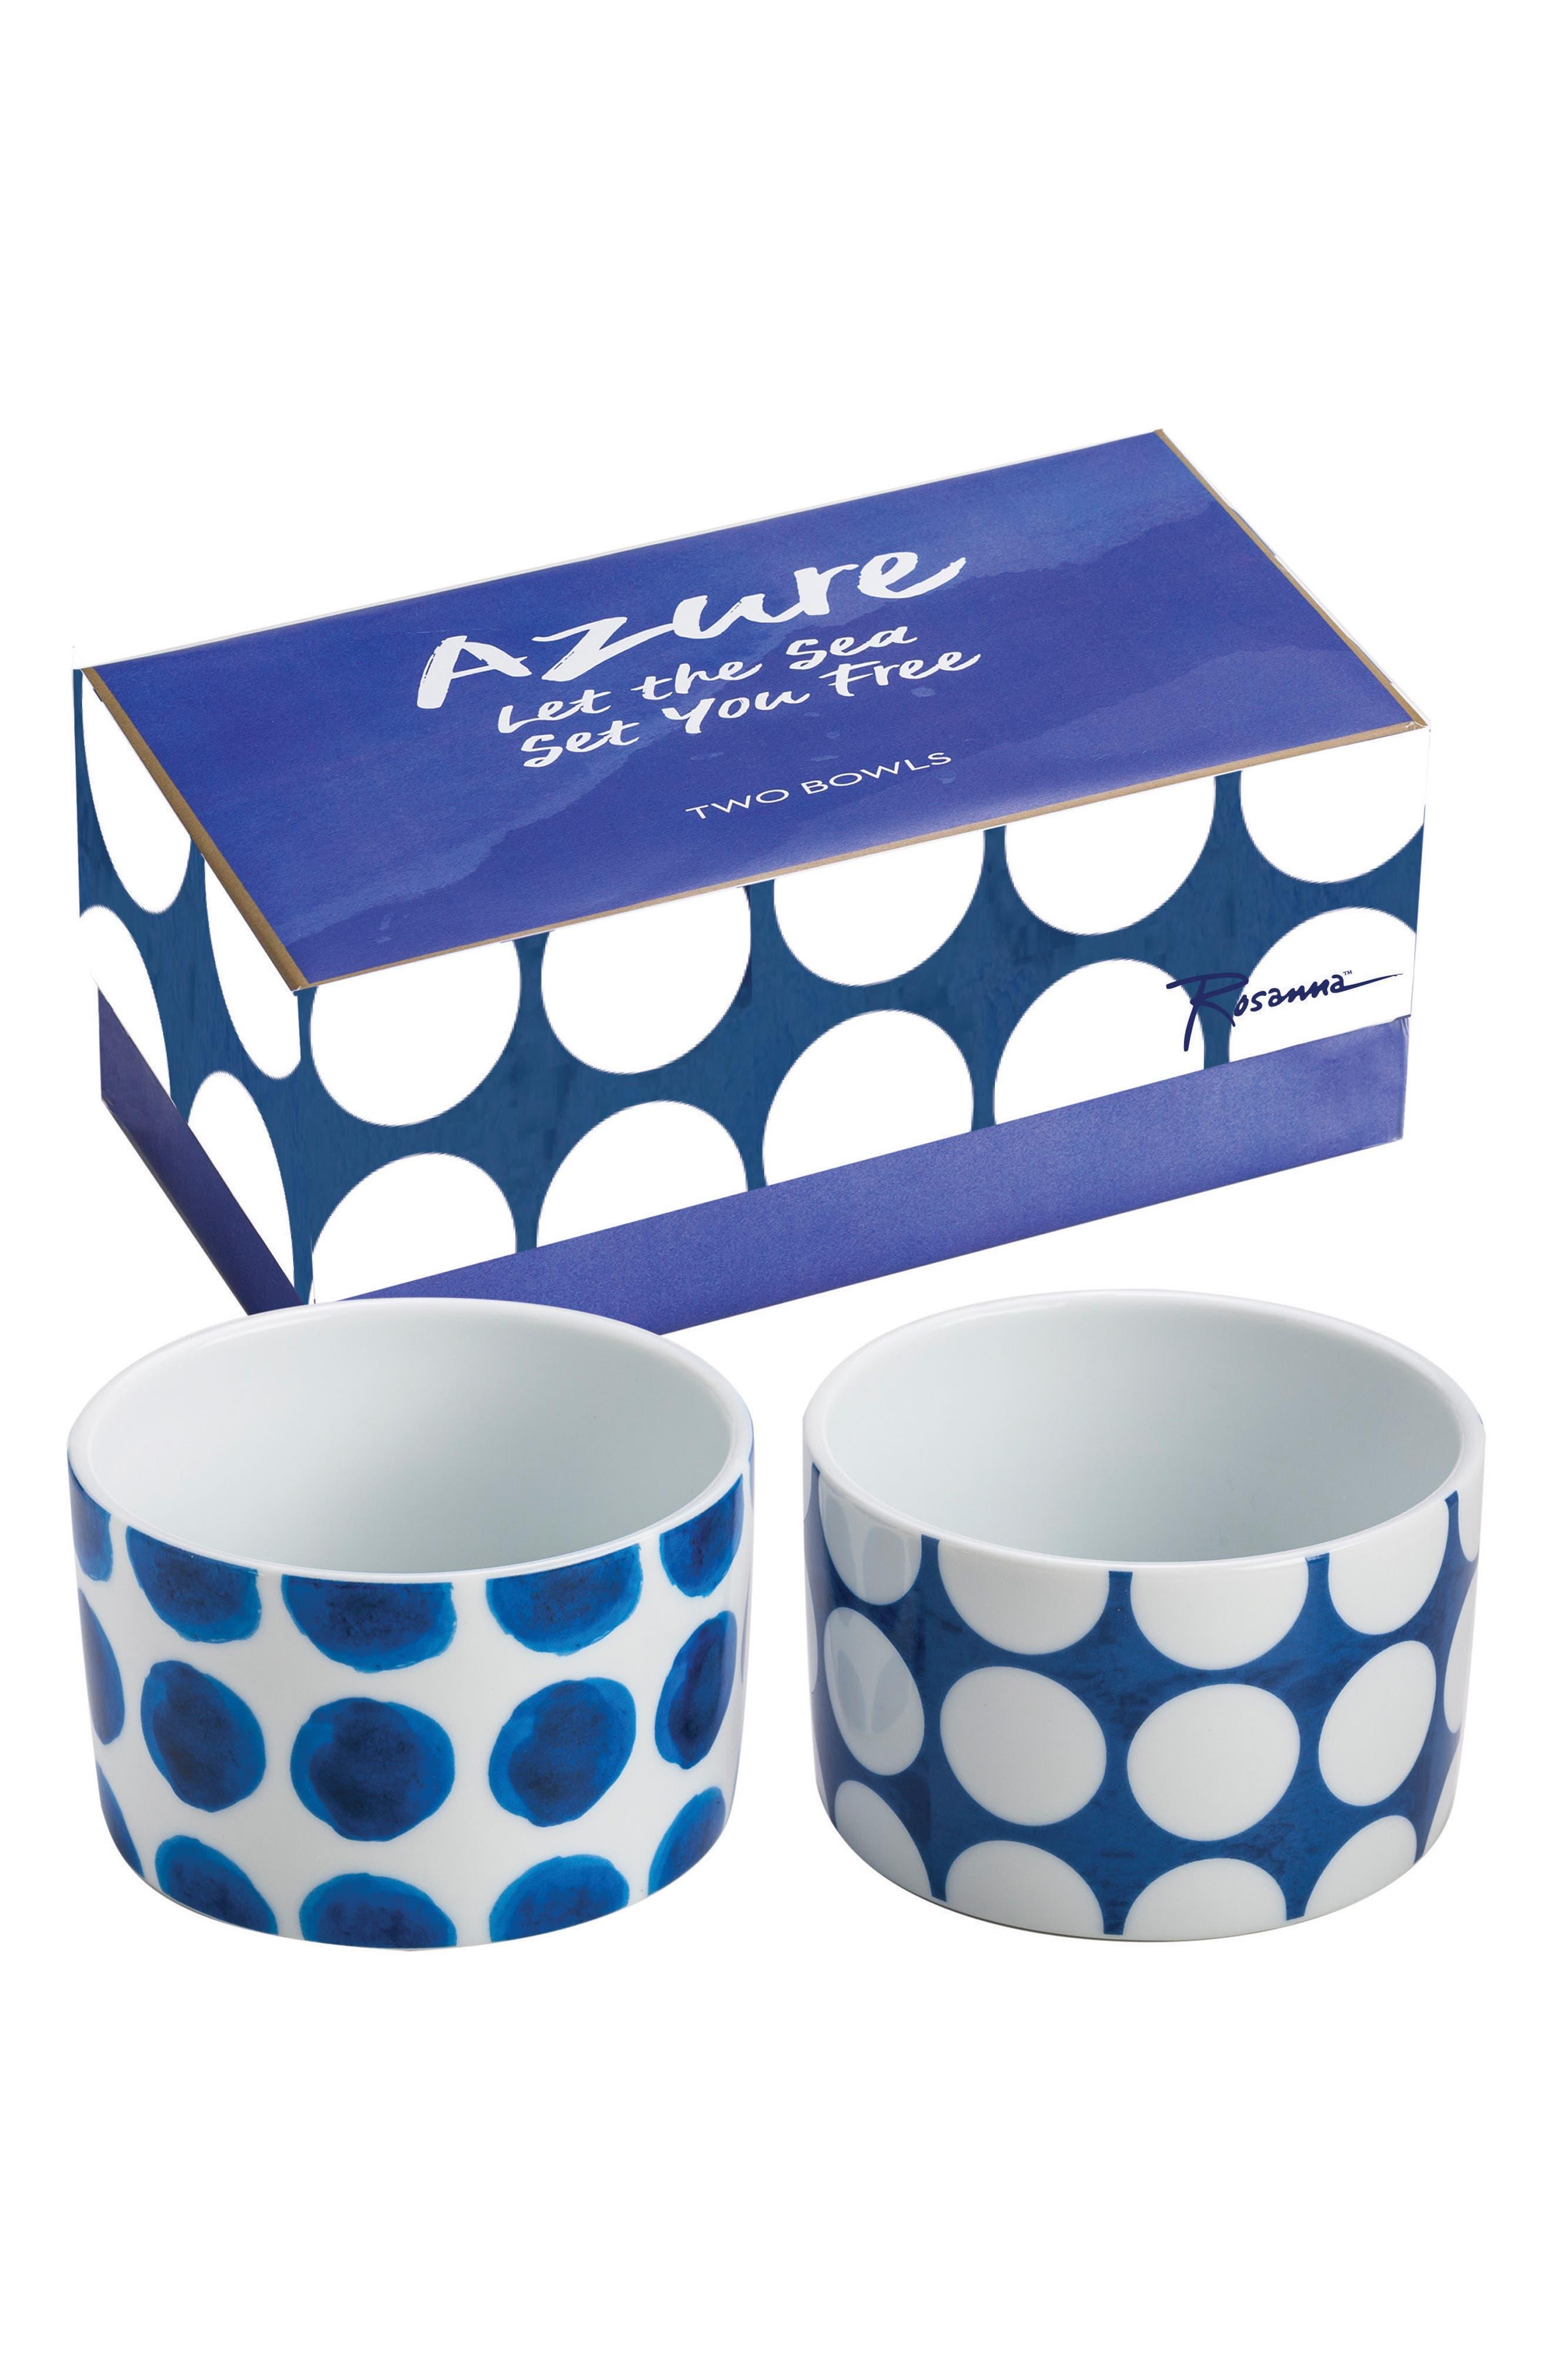 Polka Dot Set of 2 Bowls,                             Main thumbnail 1, color,                             Blue/ White